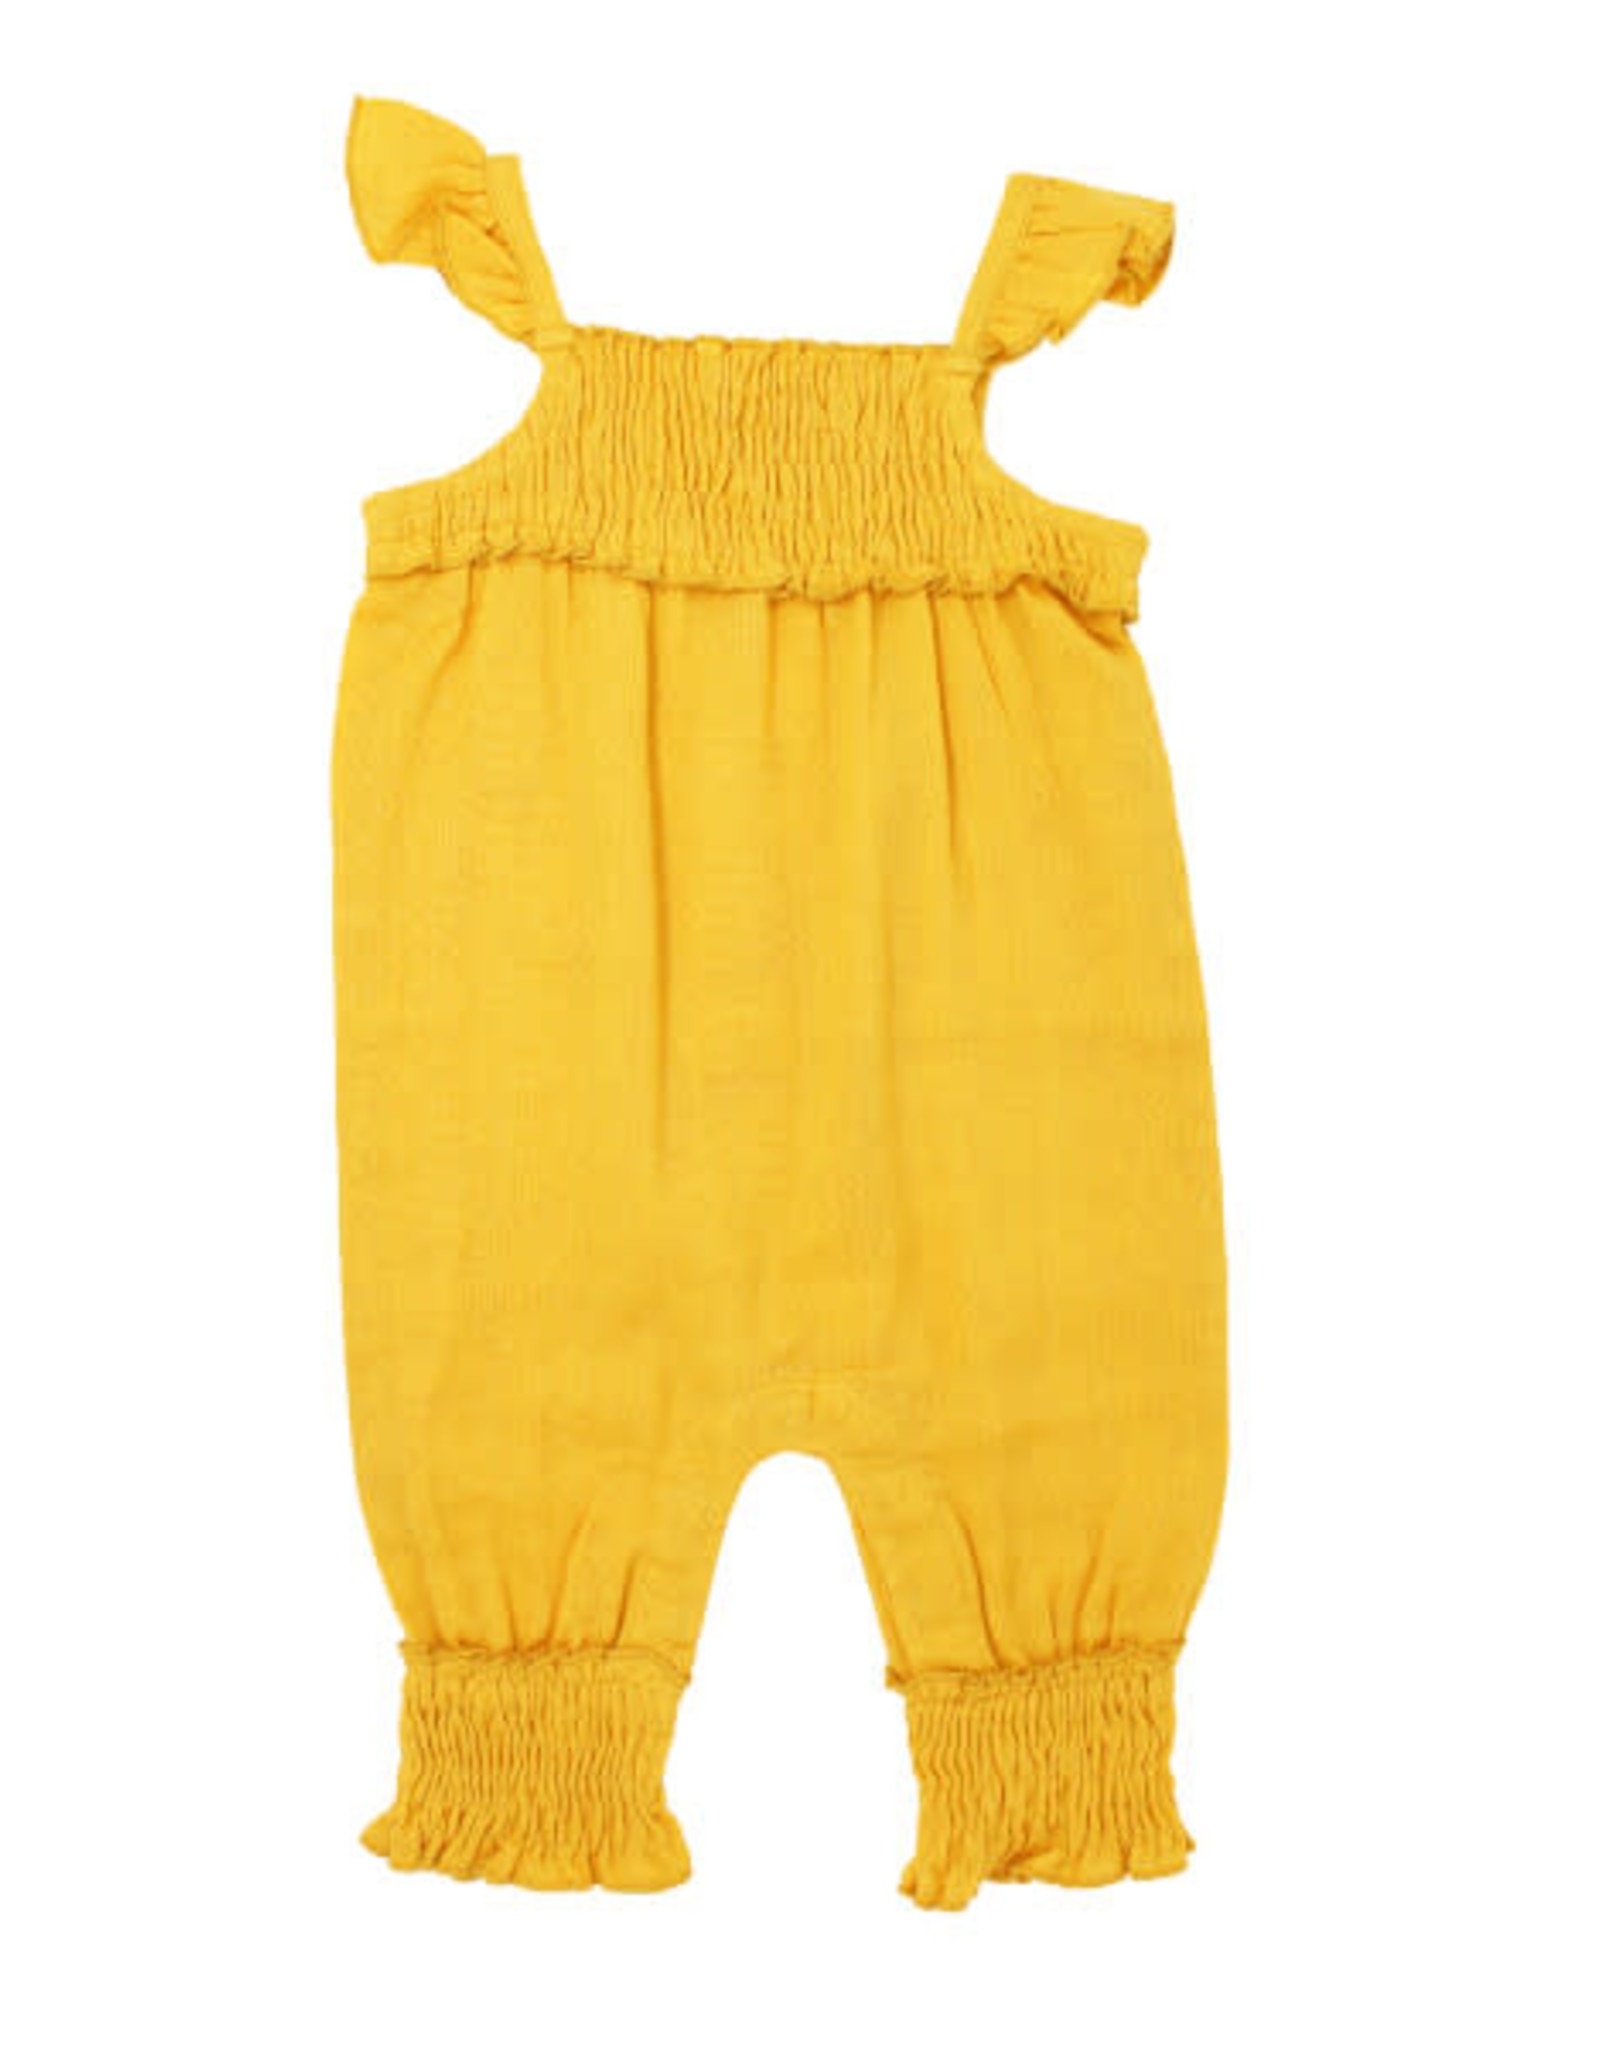 L'oved Baby Kids' Muslin Sleeveless Romper Saffron